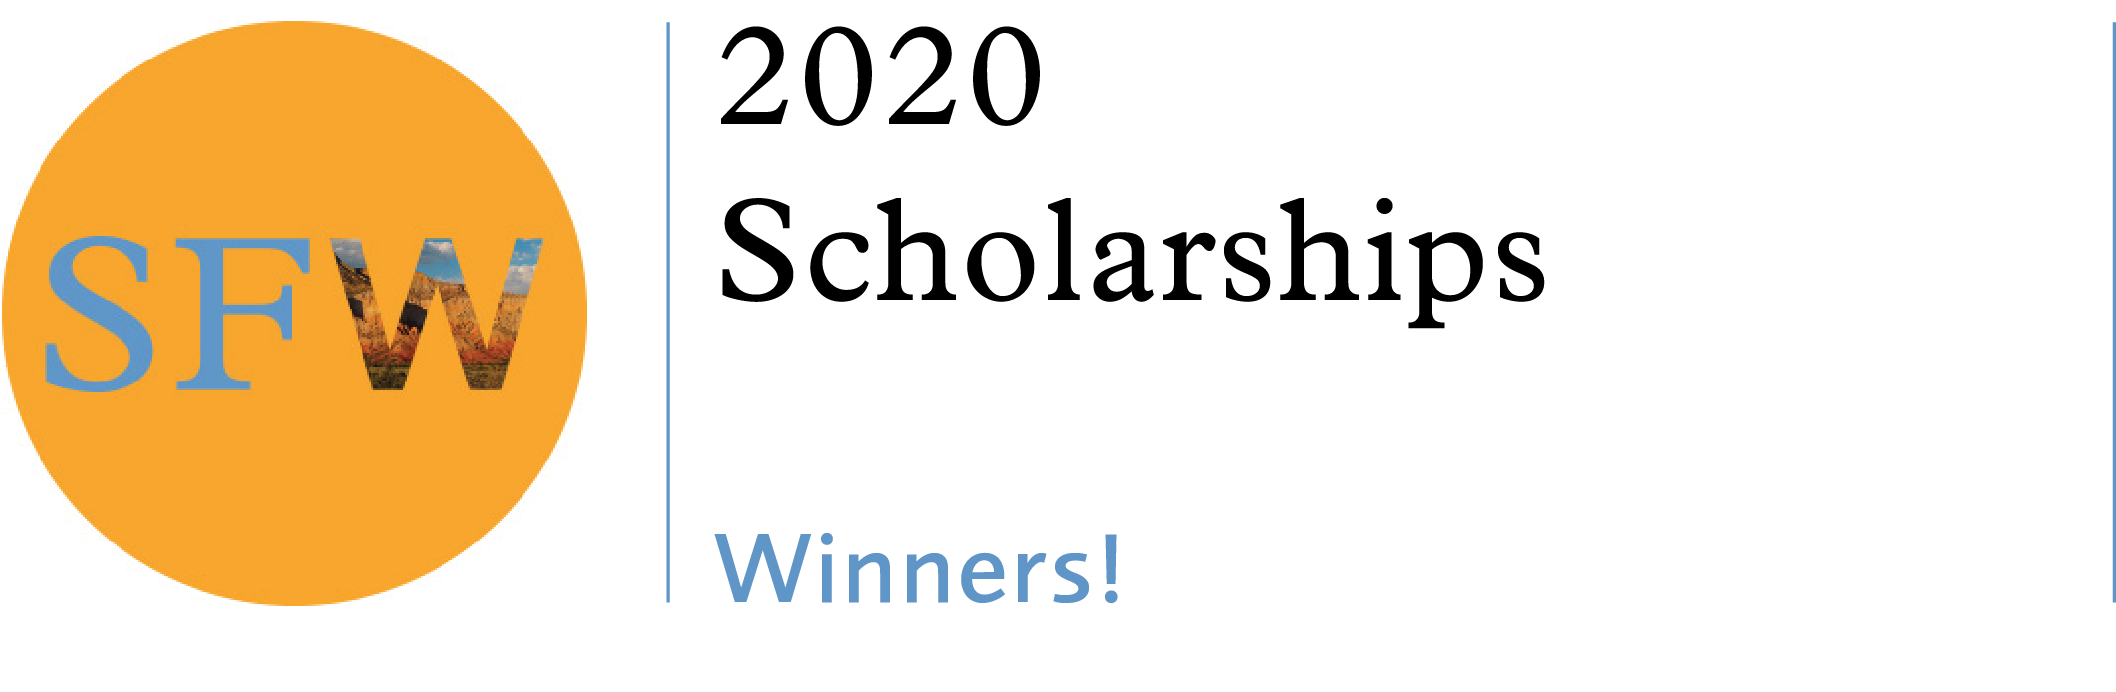 SFW 2020 Scholarship Winners